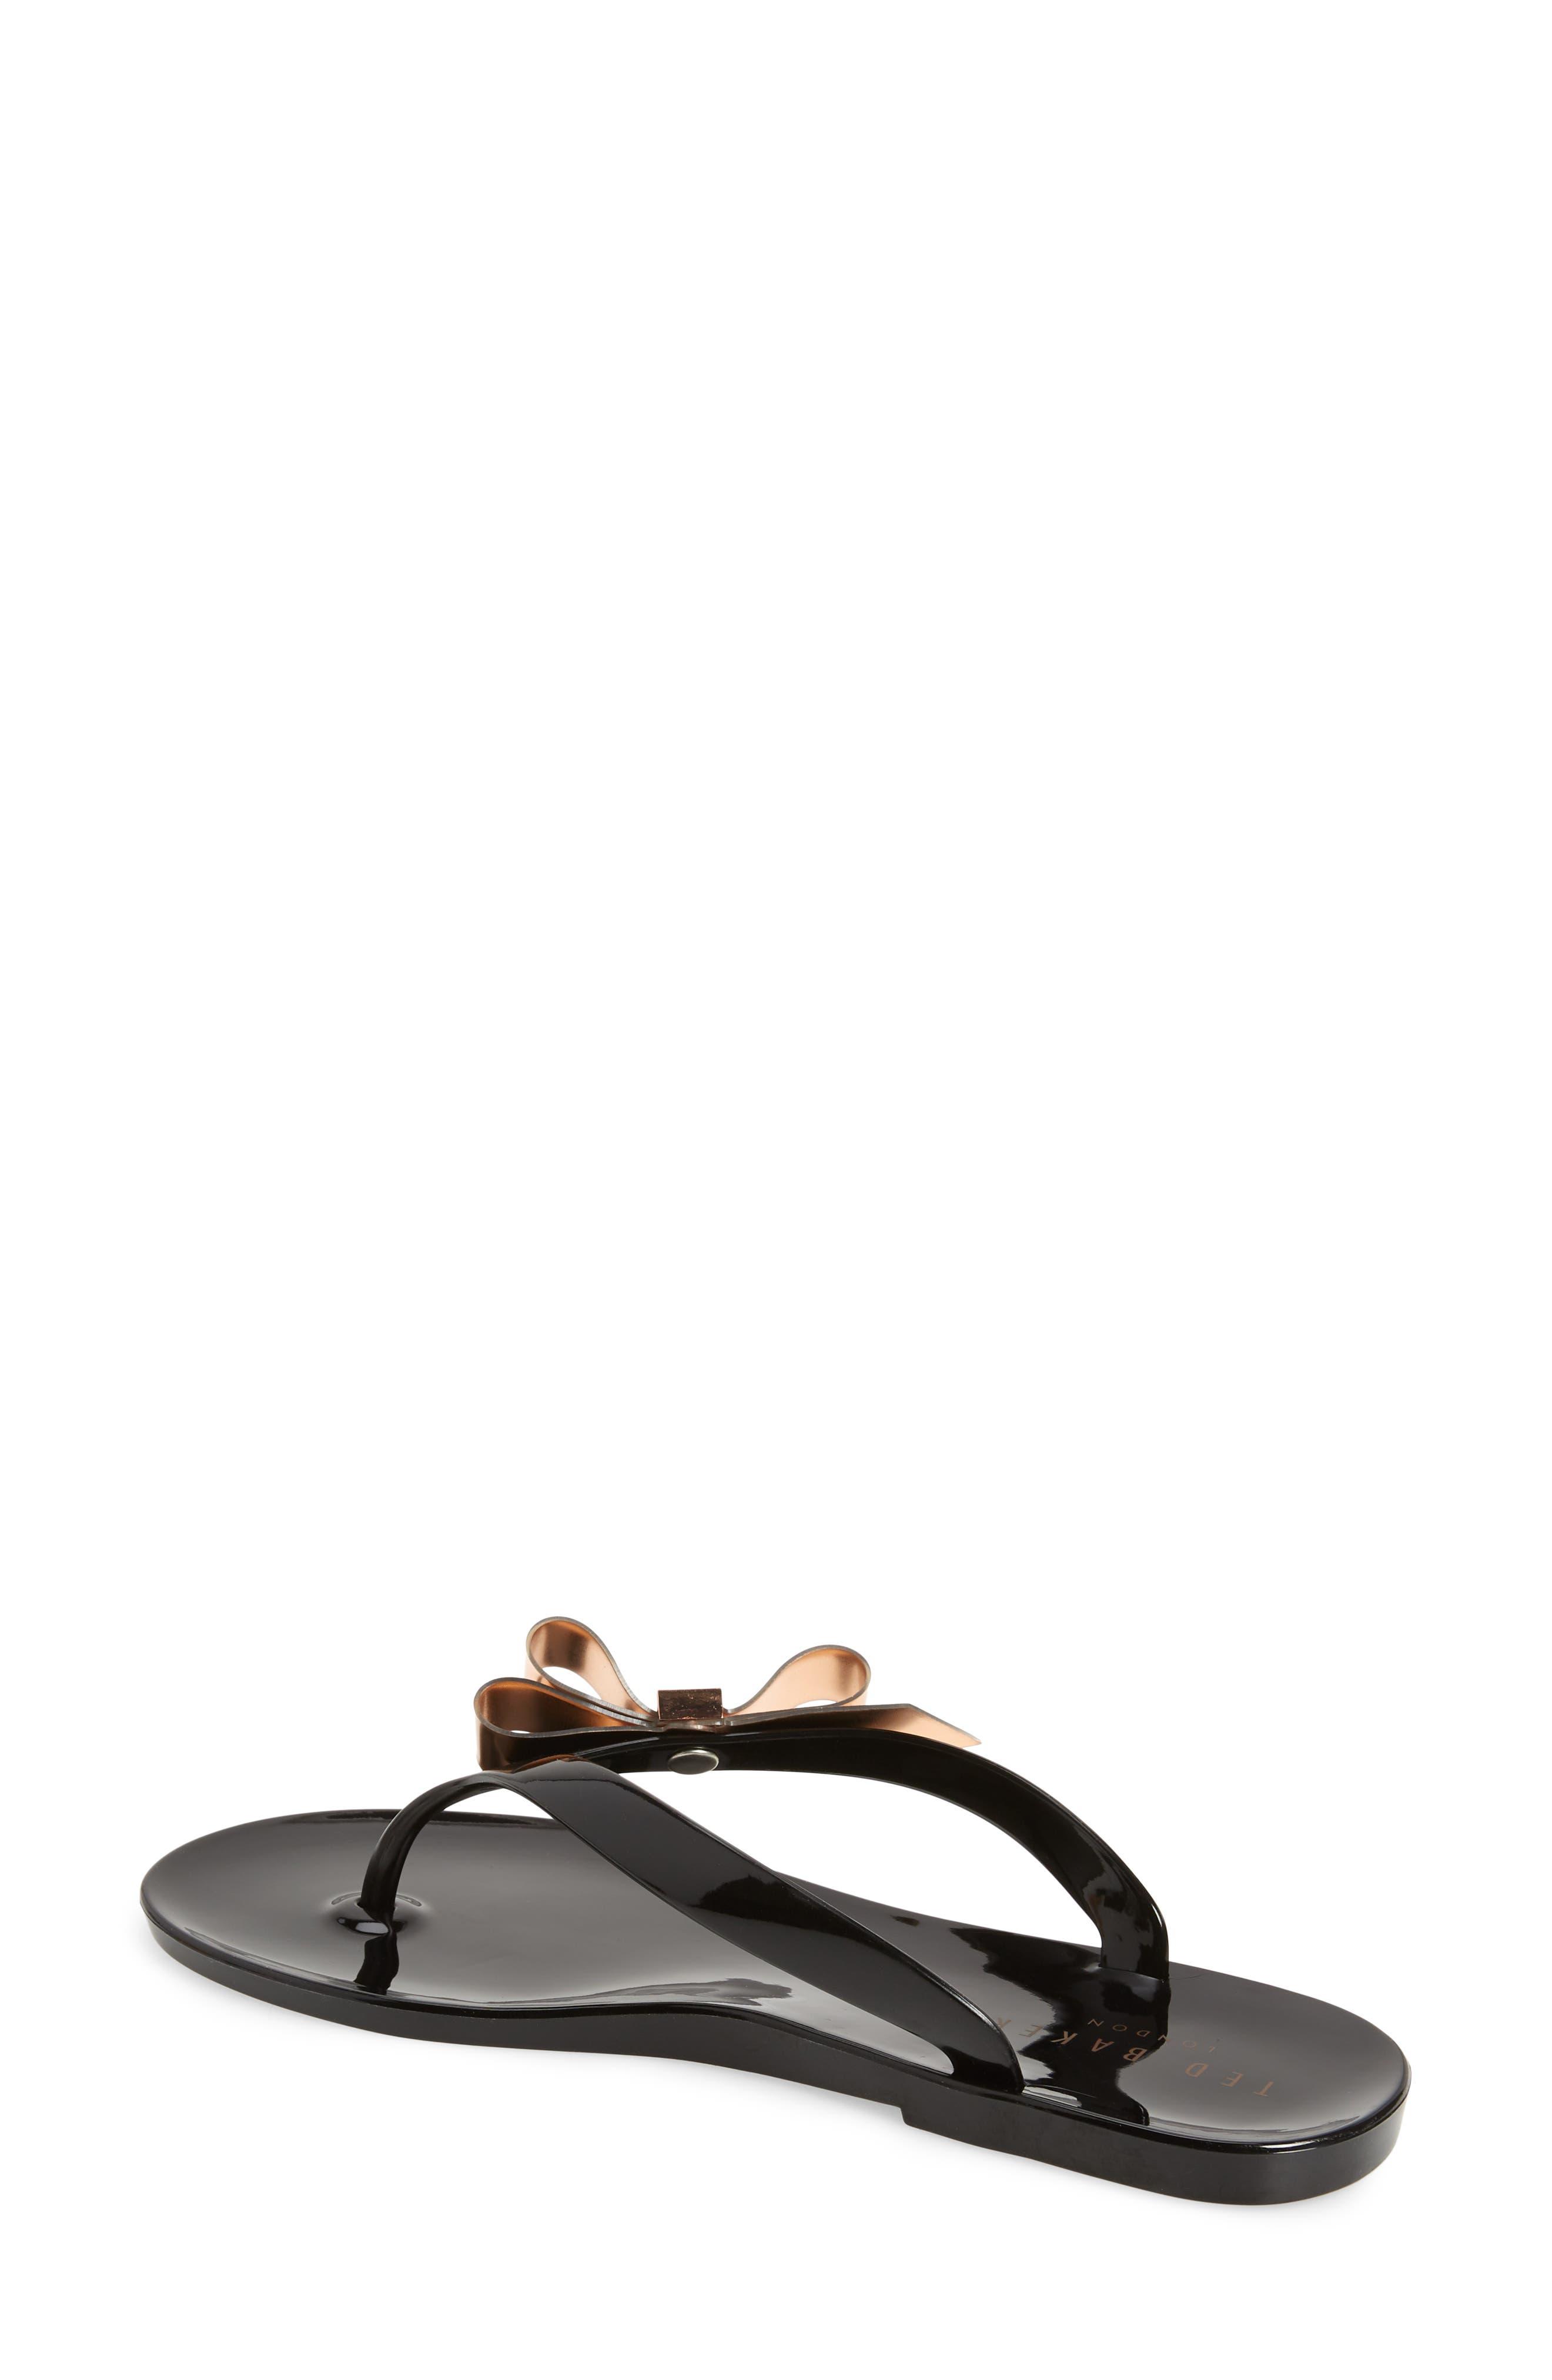 57ee18b5cbce Ted Baker London Flip-Flops   Sandals for Women